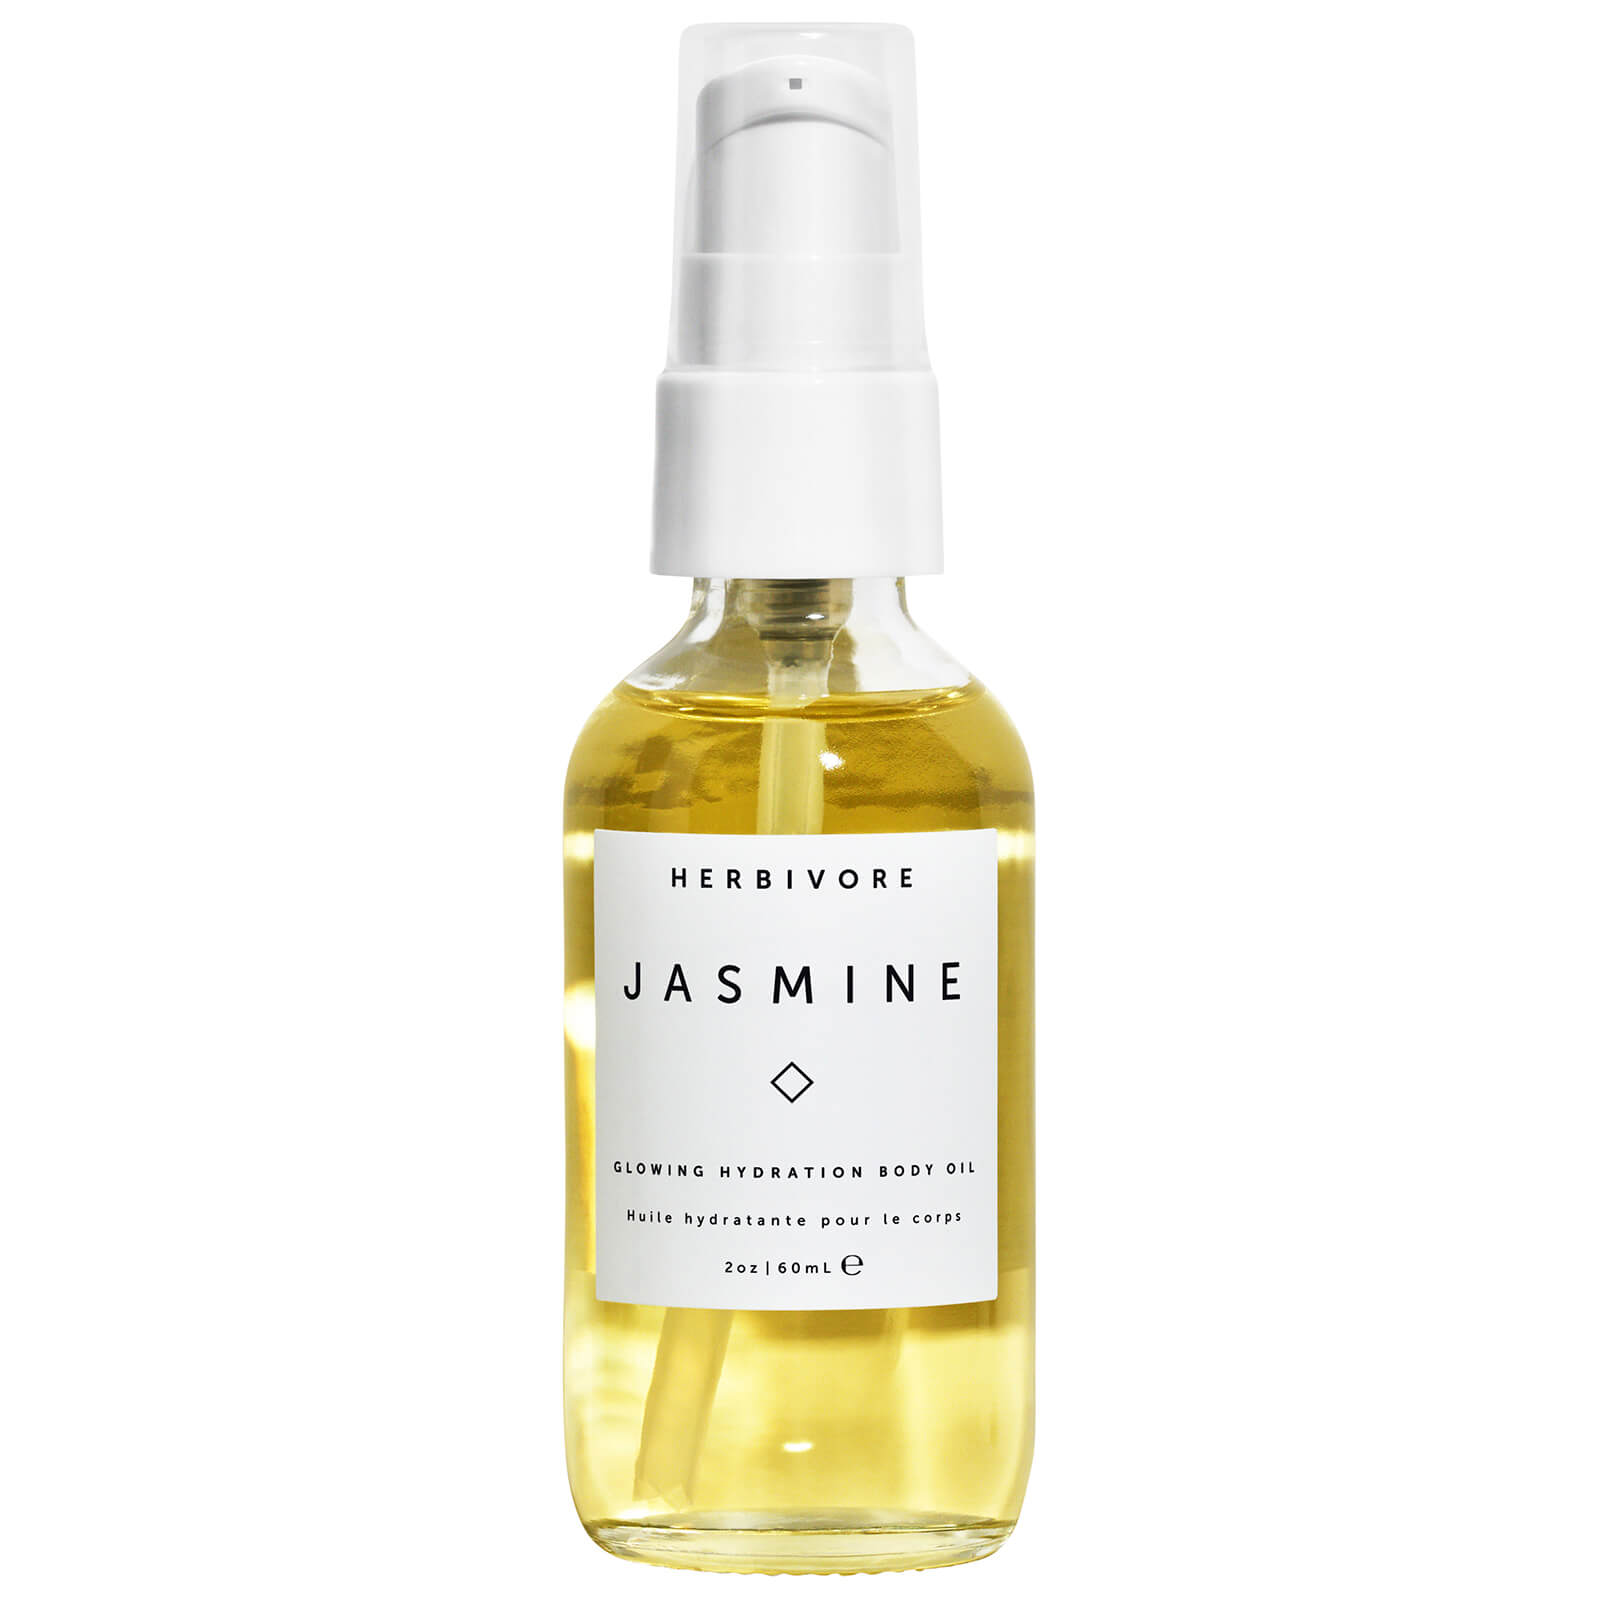 Купить Herbivore Jasmine Glowing Hydration Body Oil 60ml